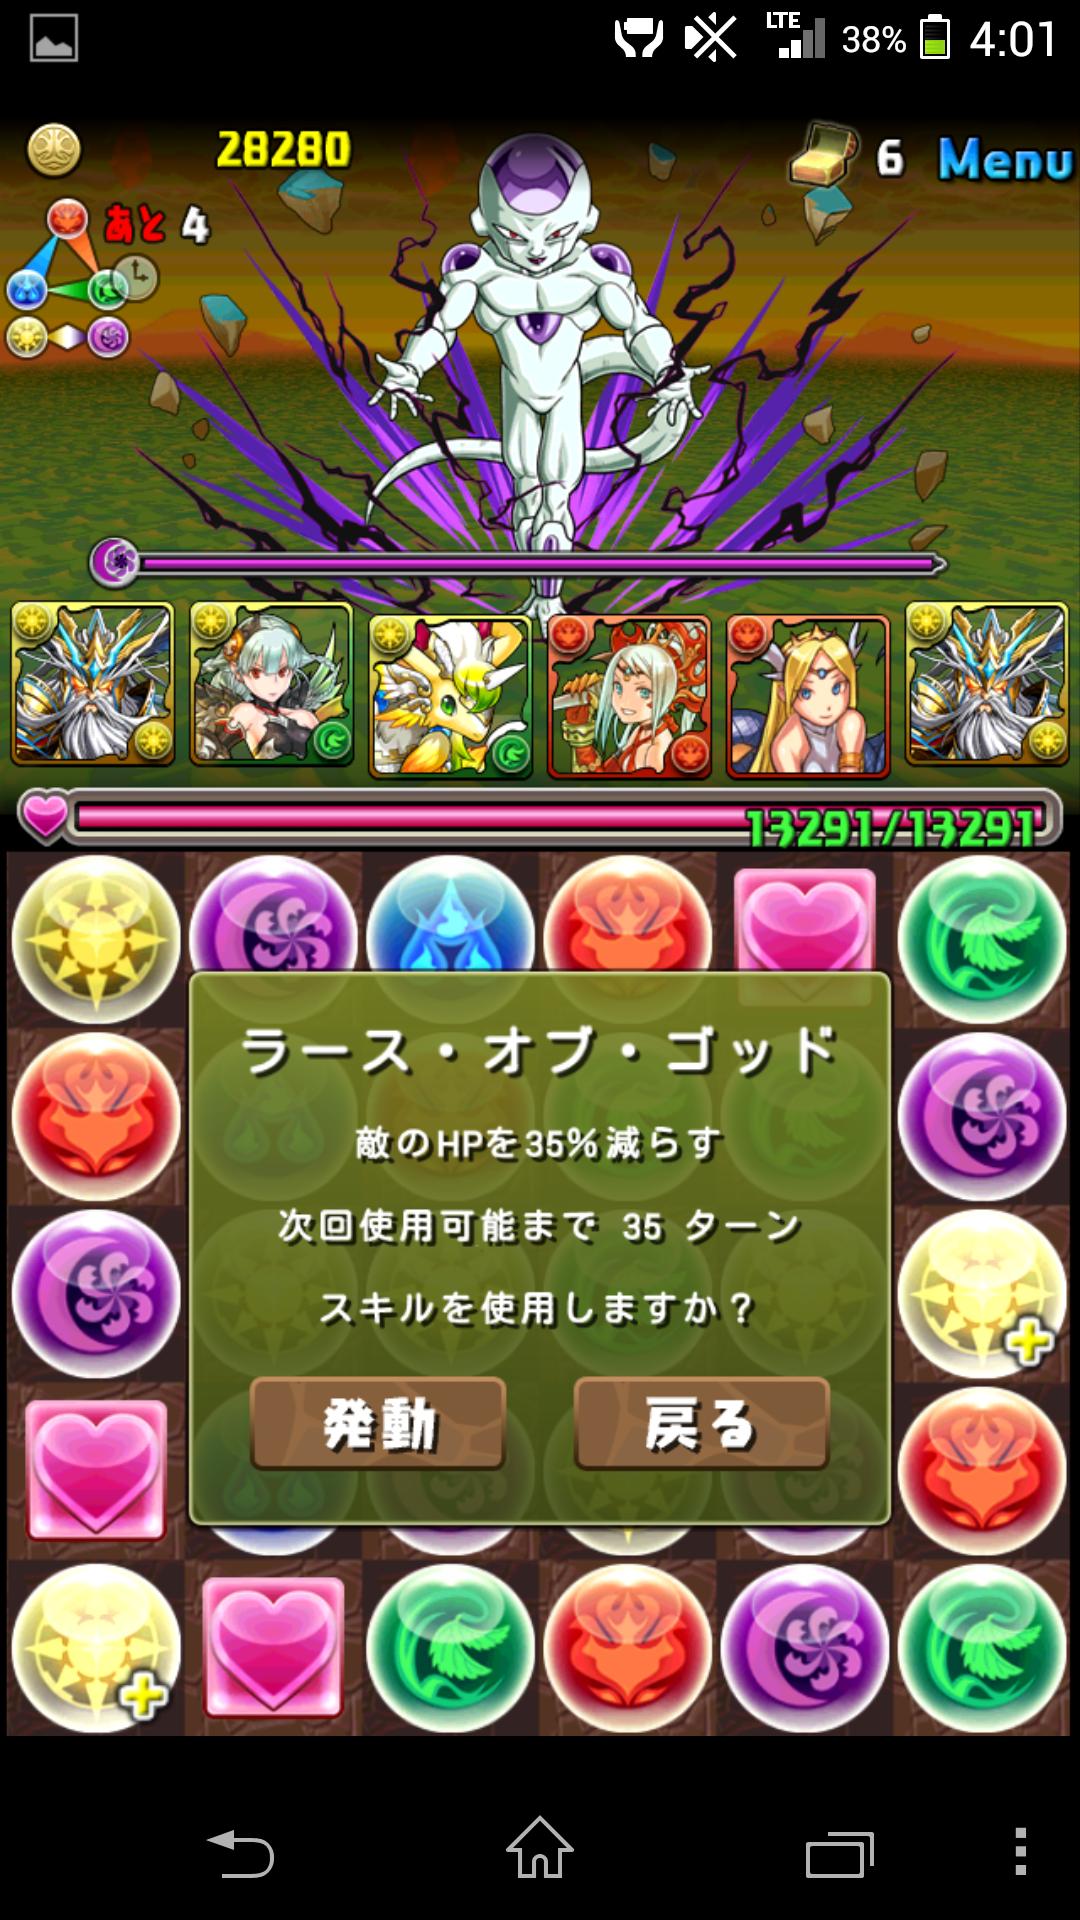 Screenshot_2014-06-06-04-01-10.png